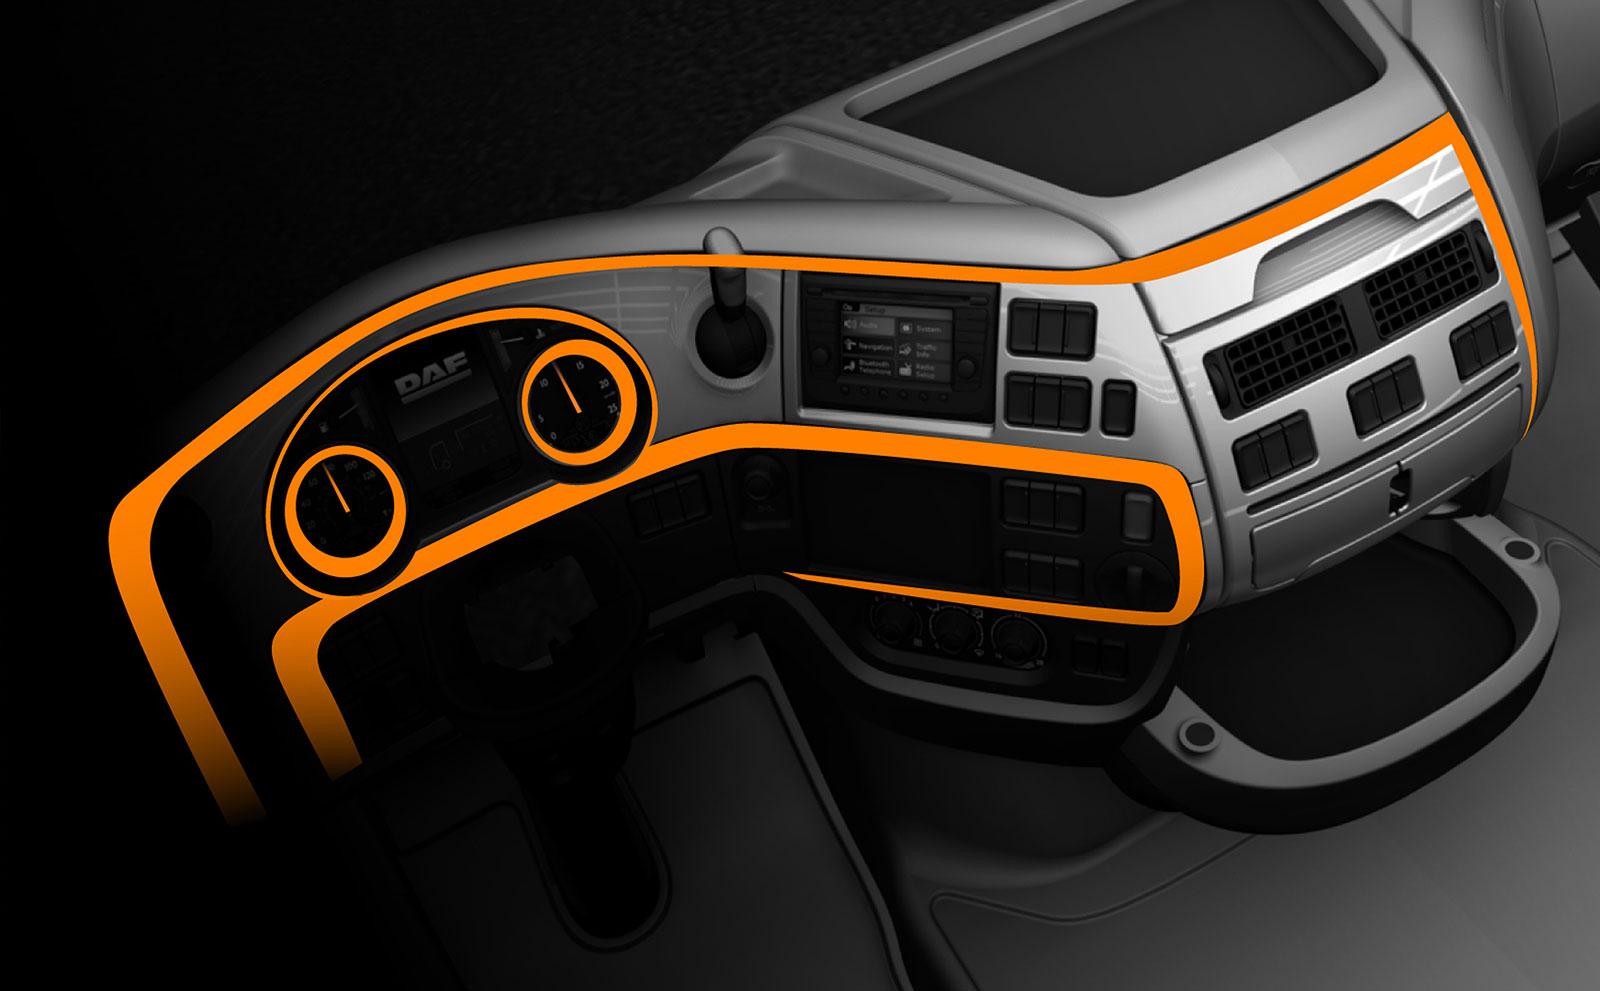 http://www.carbodydesign.com/media/2013/04/DAF-XF-Interior-keylines-01.jpg